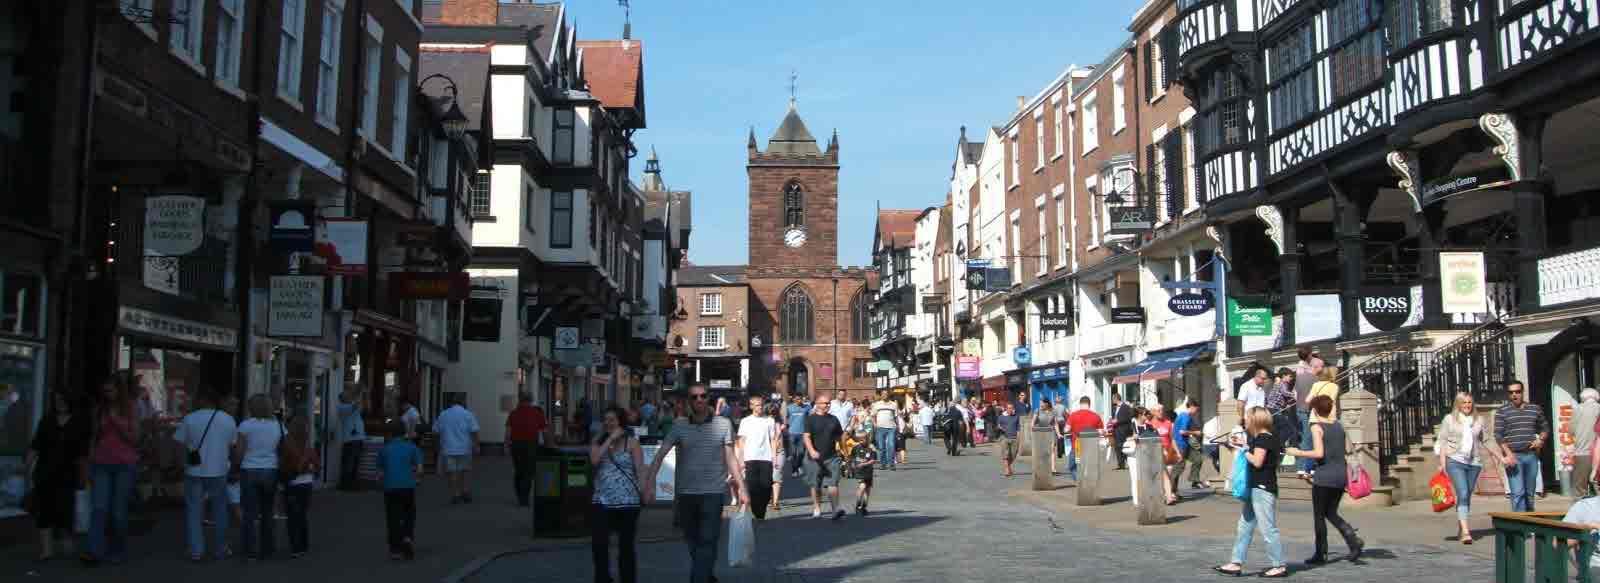 Chester shopping